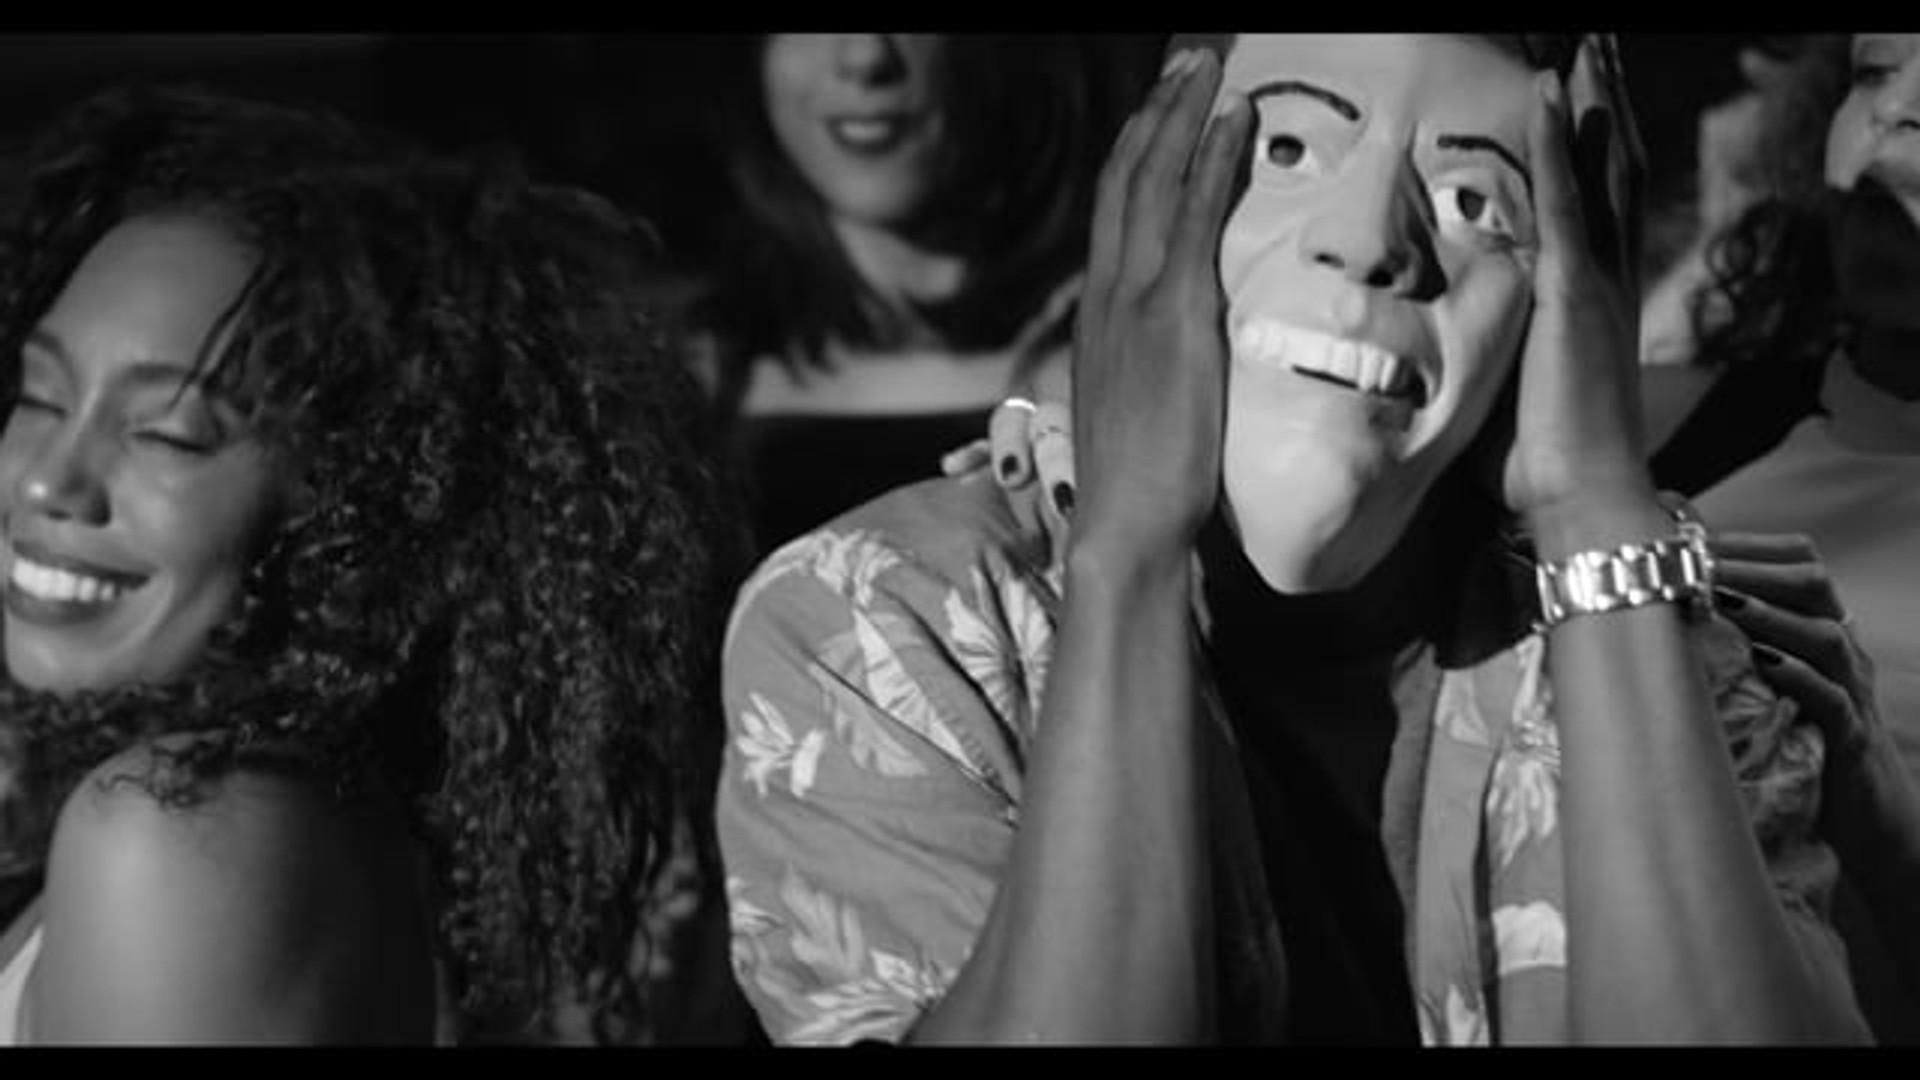 The Man - Music Video